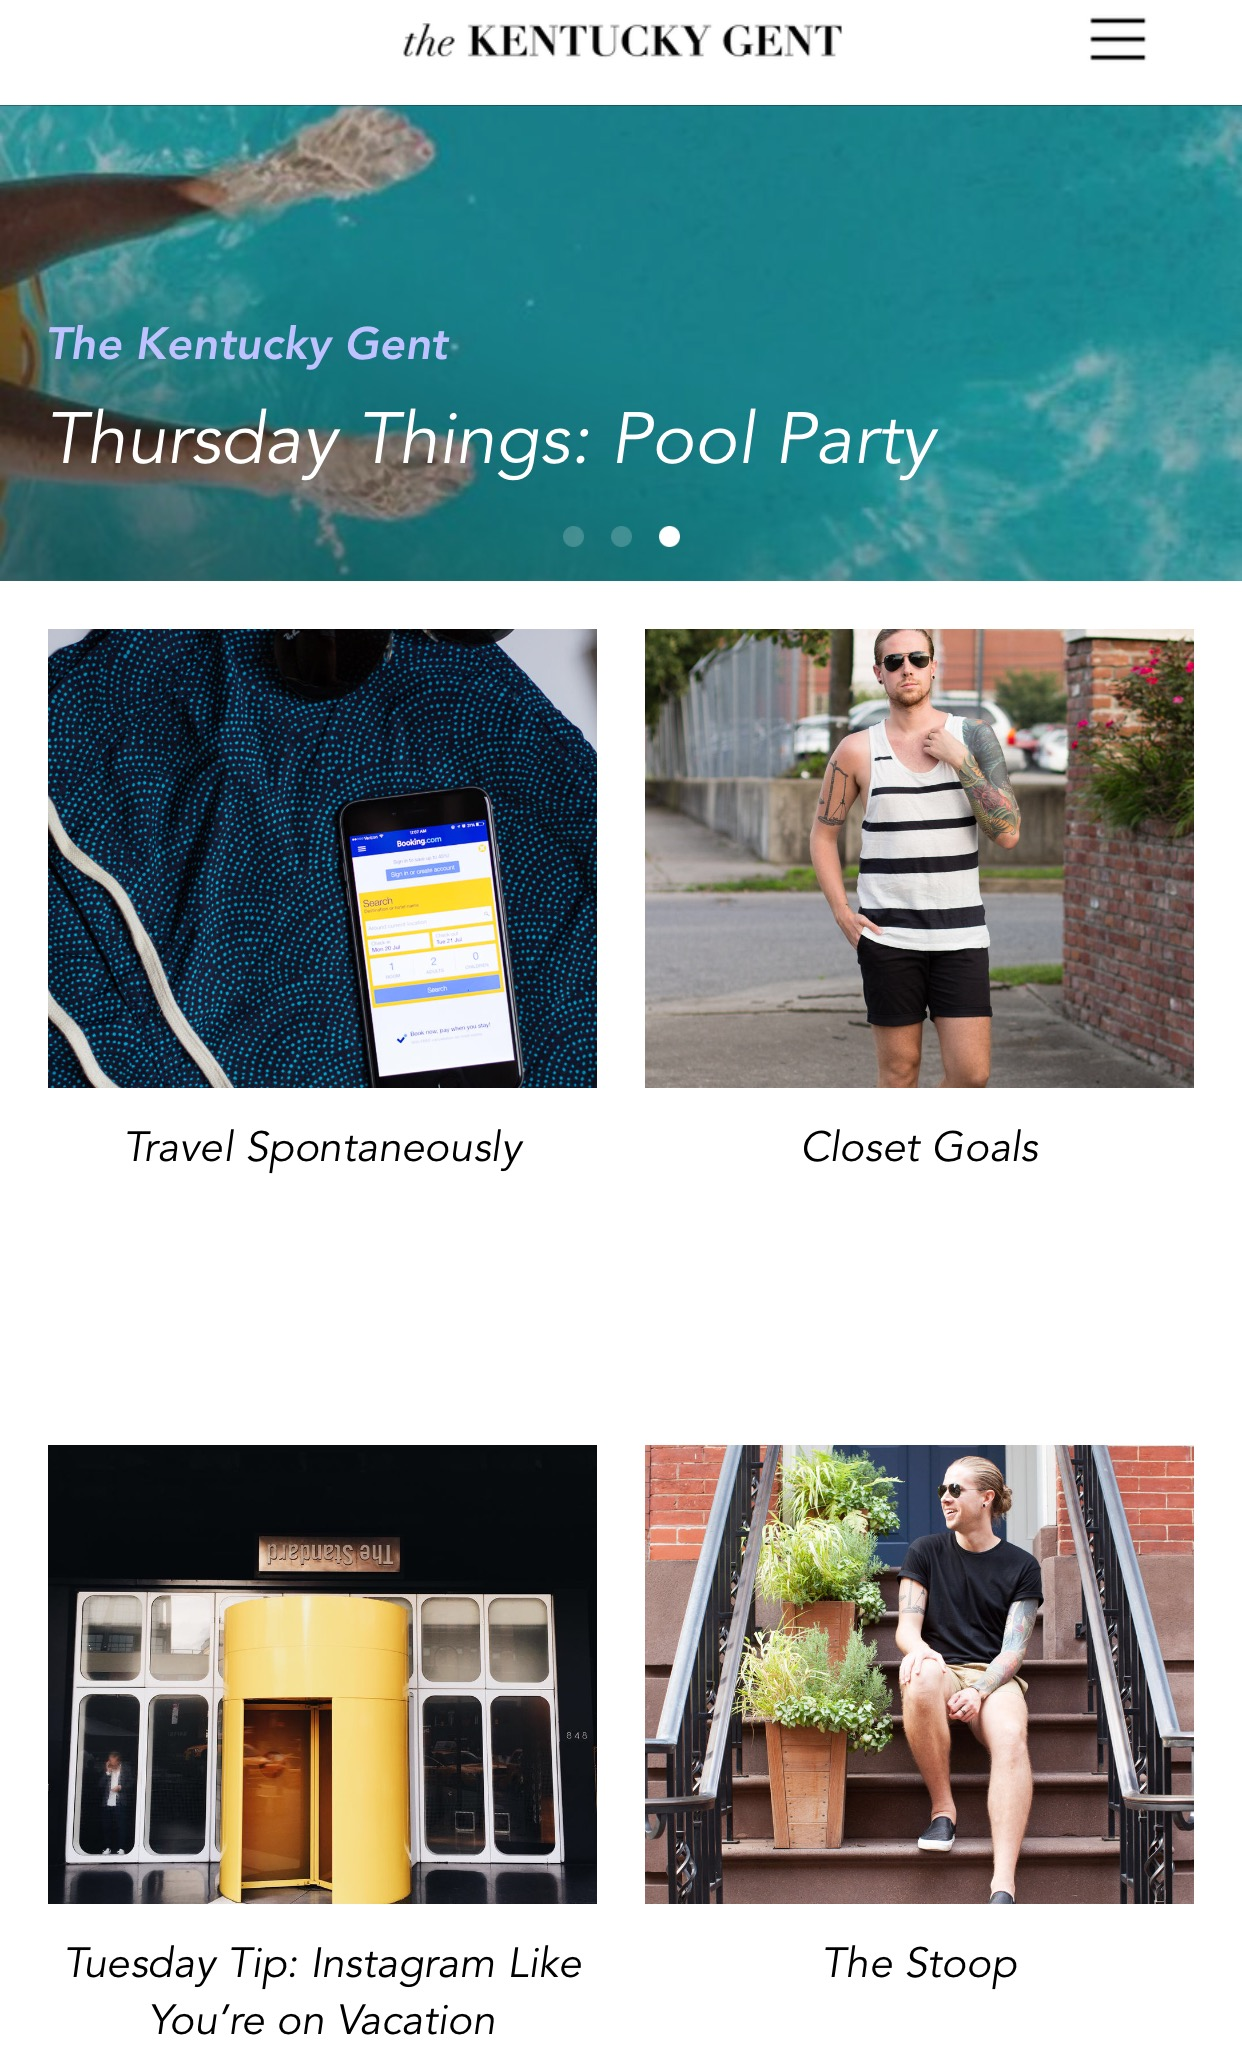 the kentucky gent, iTunes app store, app, the kentucky gent app